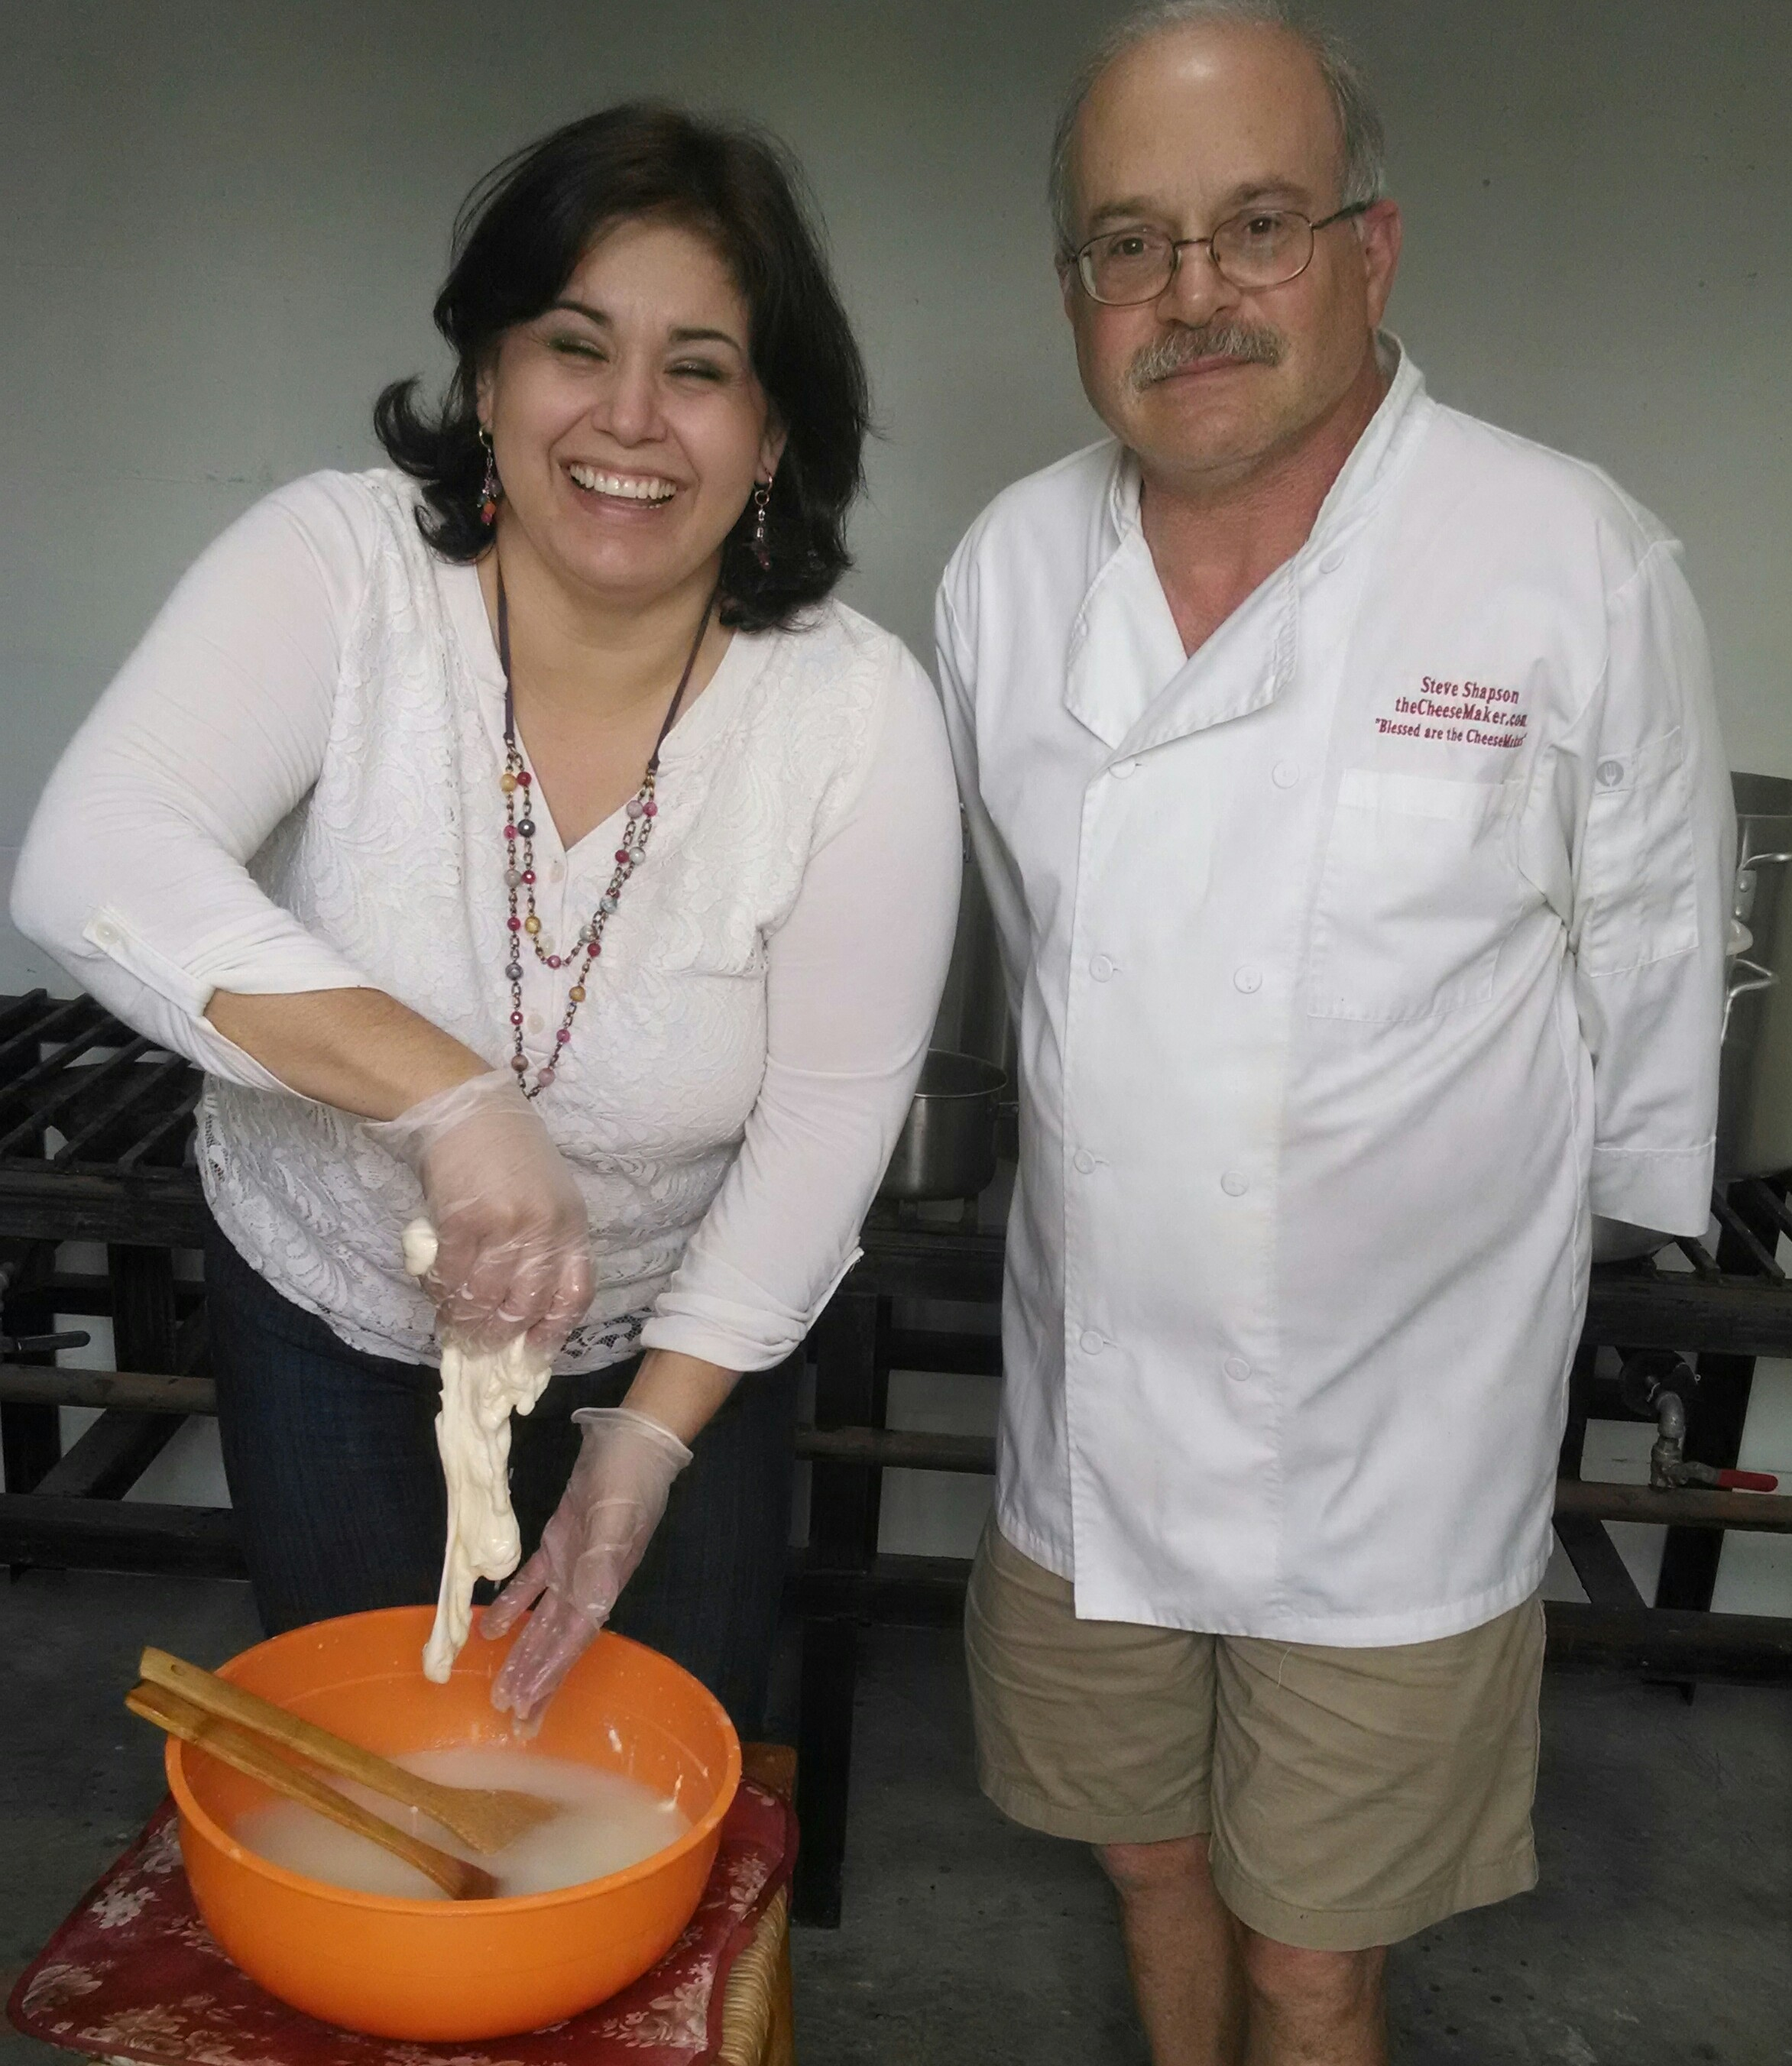 Steve Teaching Mozzarella Making